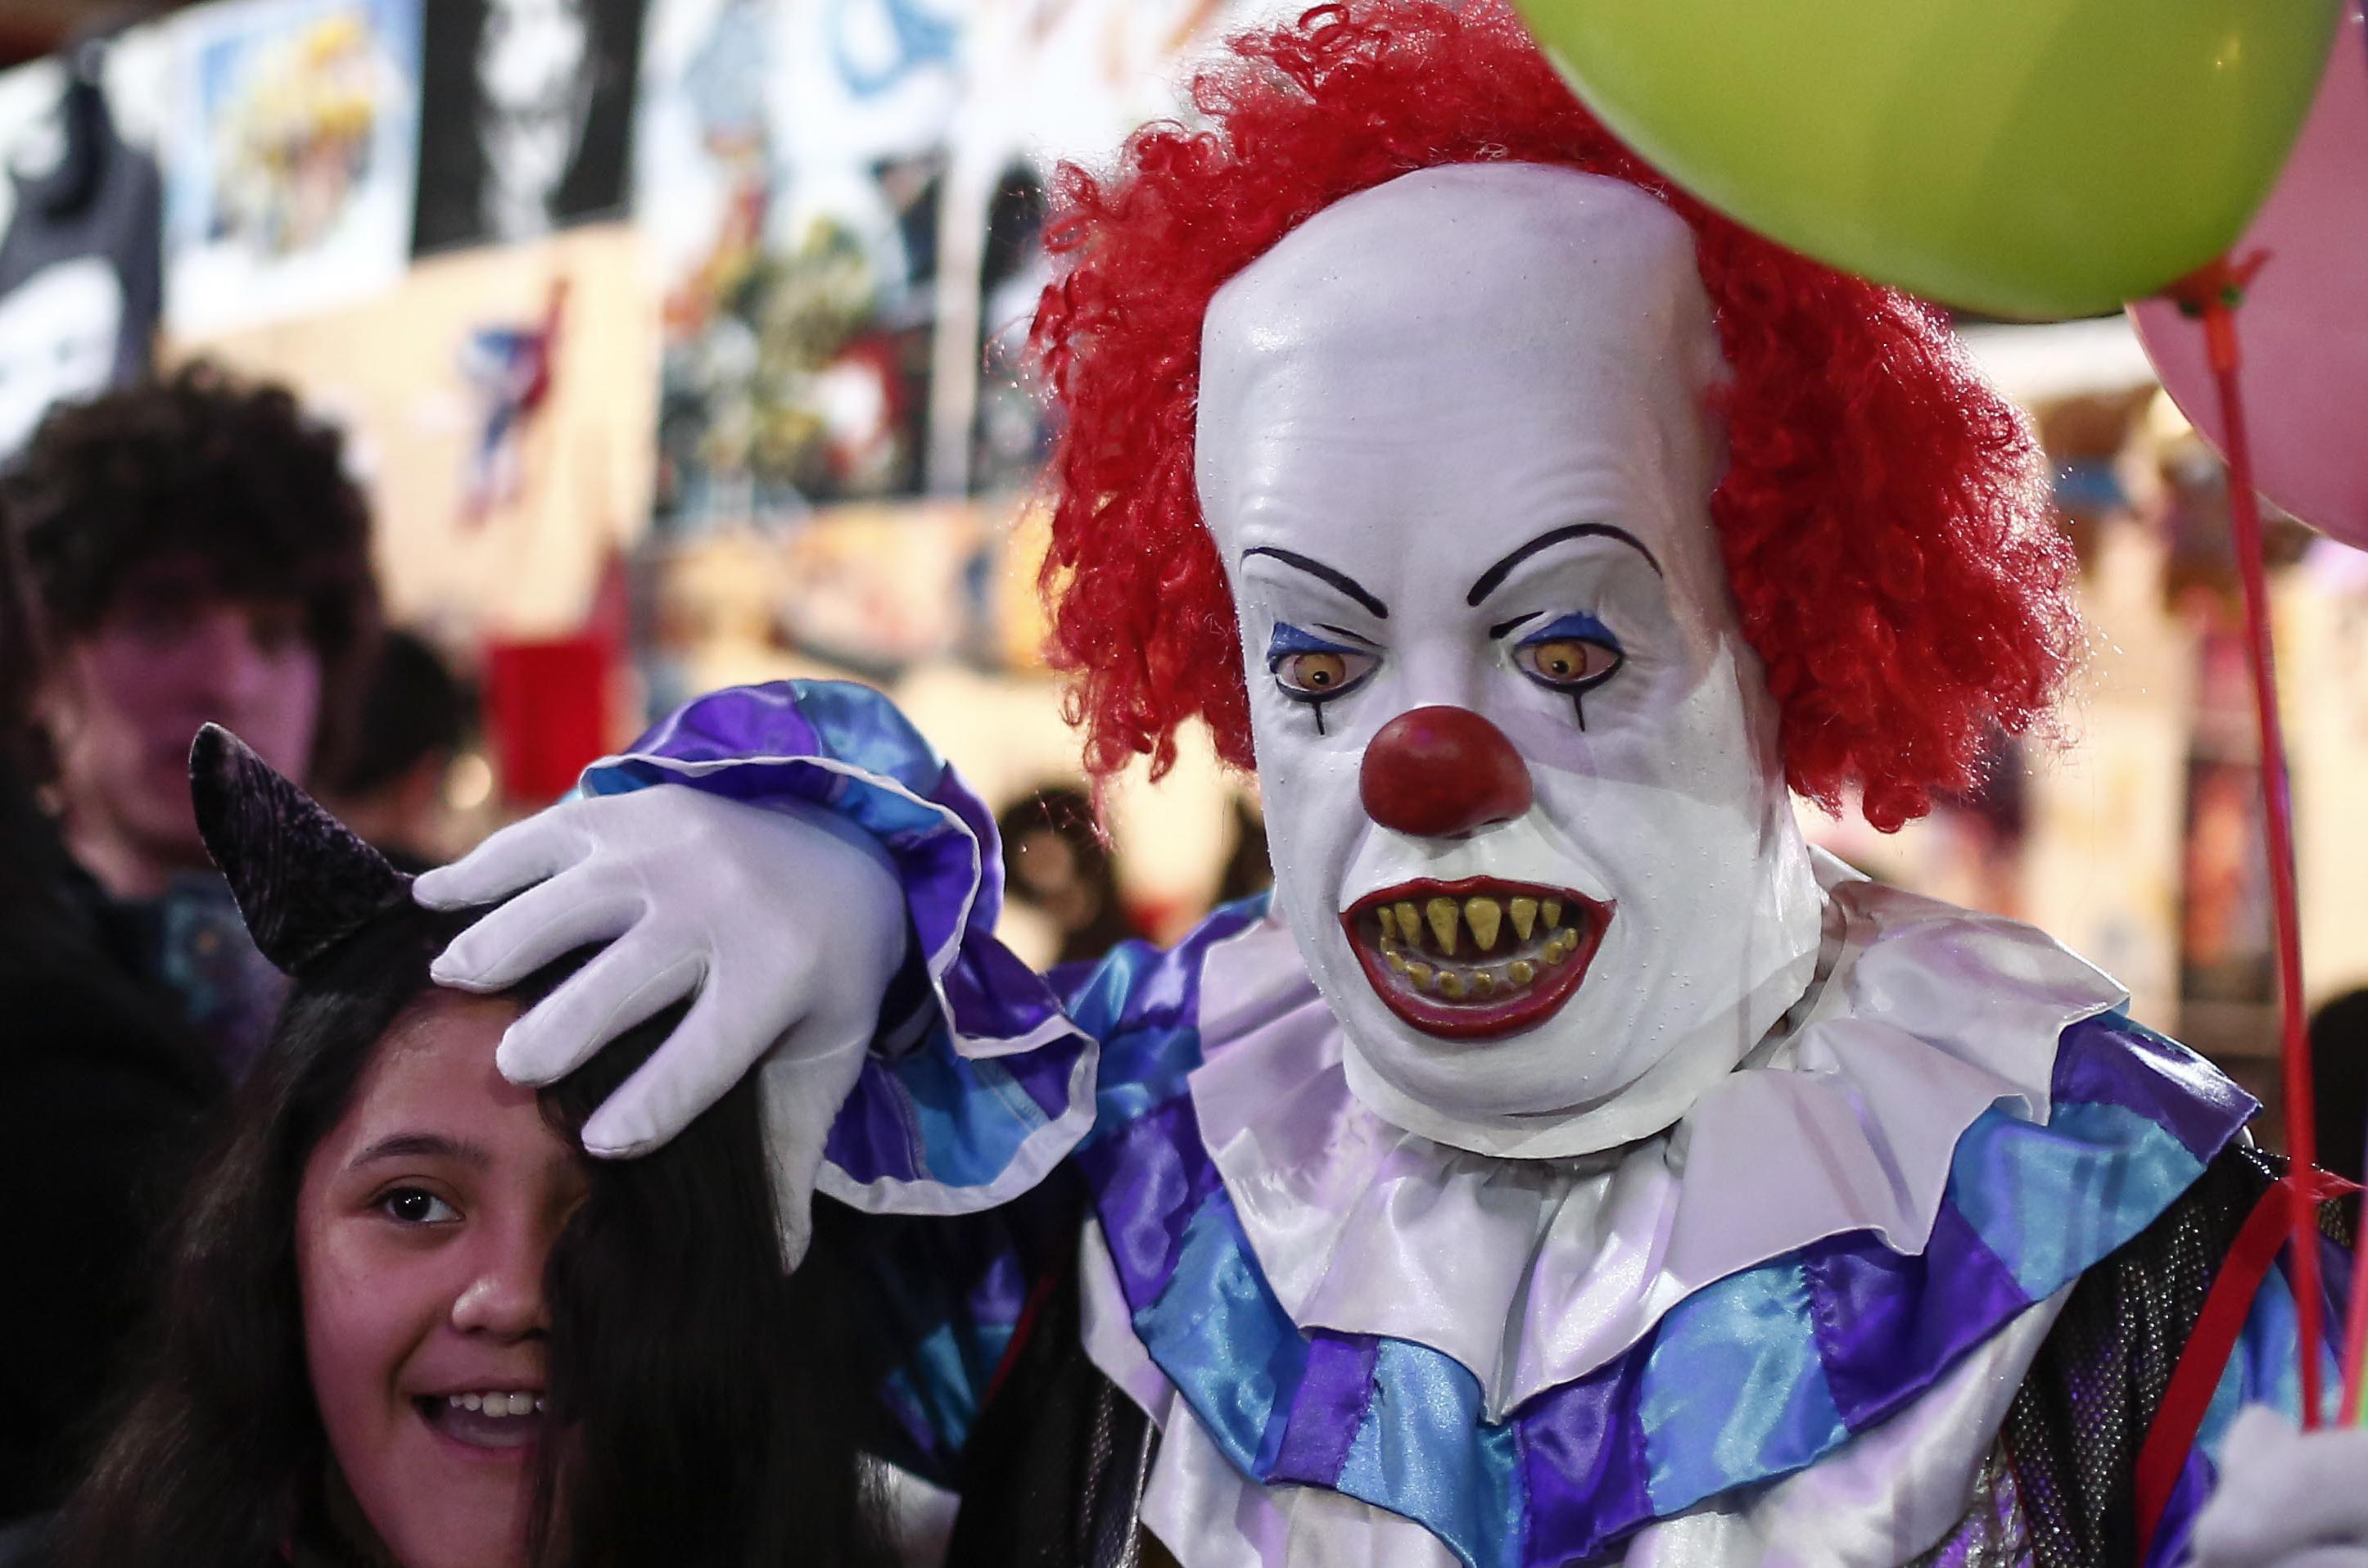 Goodwill stops sale of clown masks amidst creepy clown